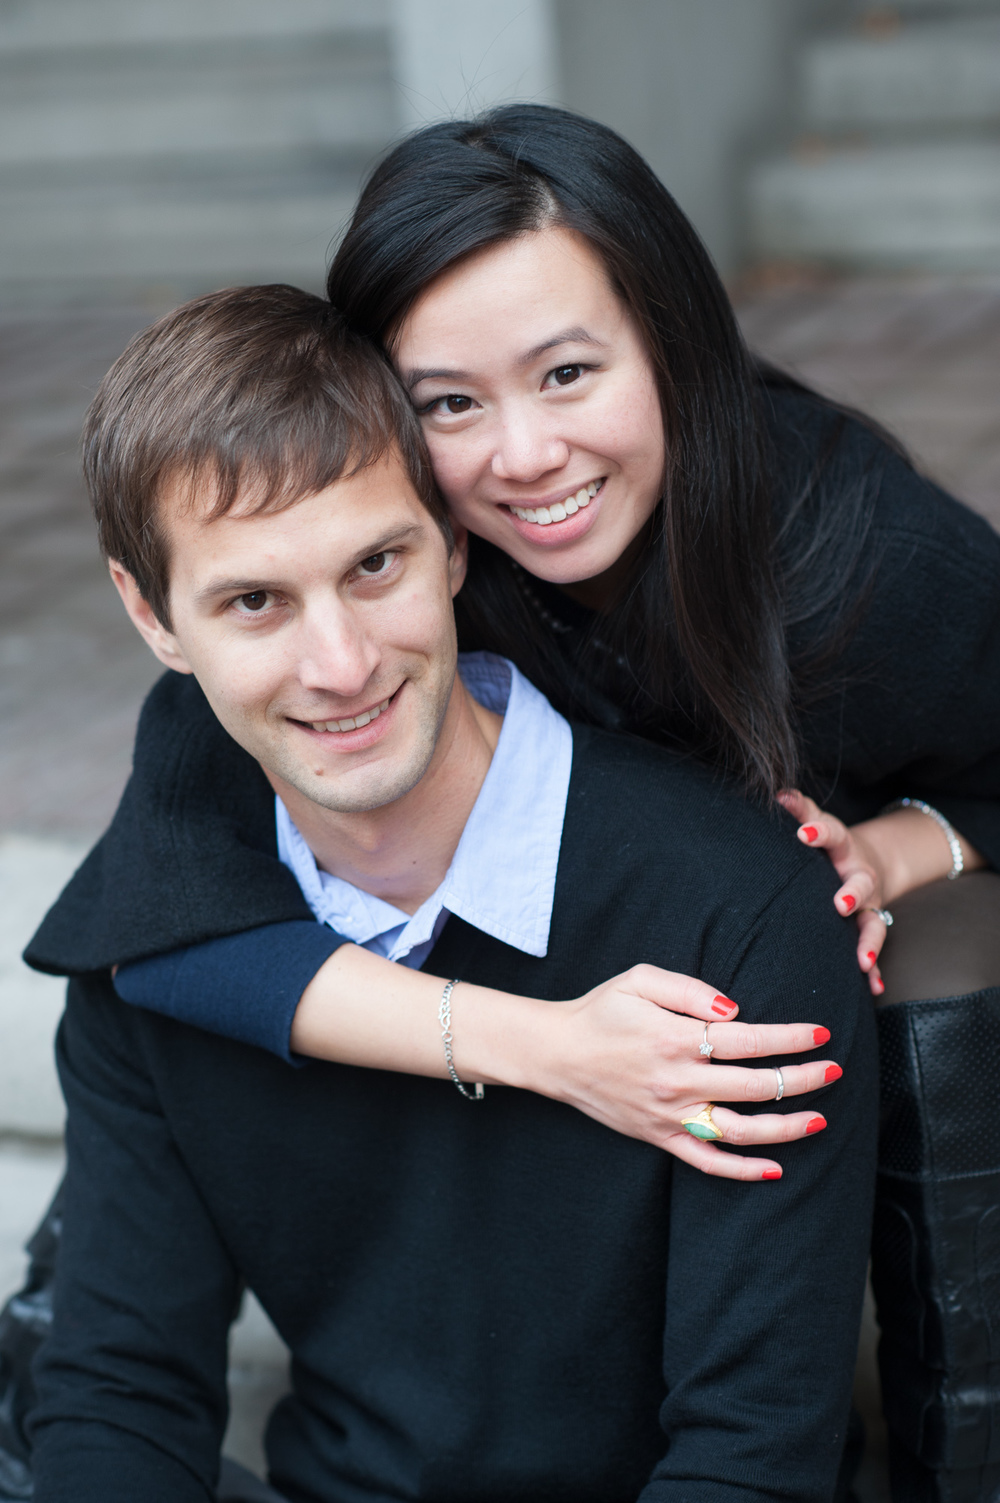 toronto-engagement-photograph-006.jpg